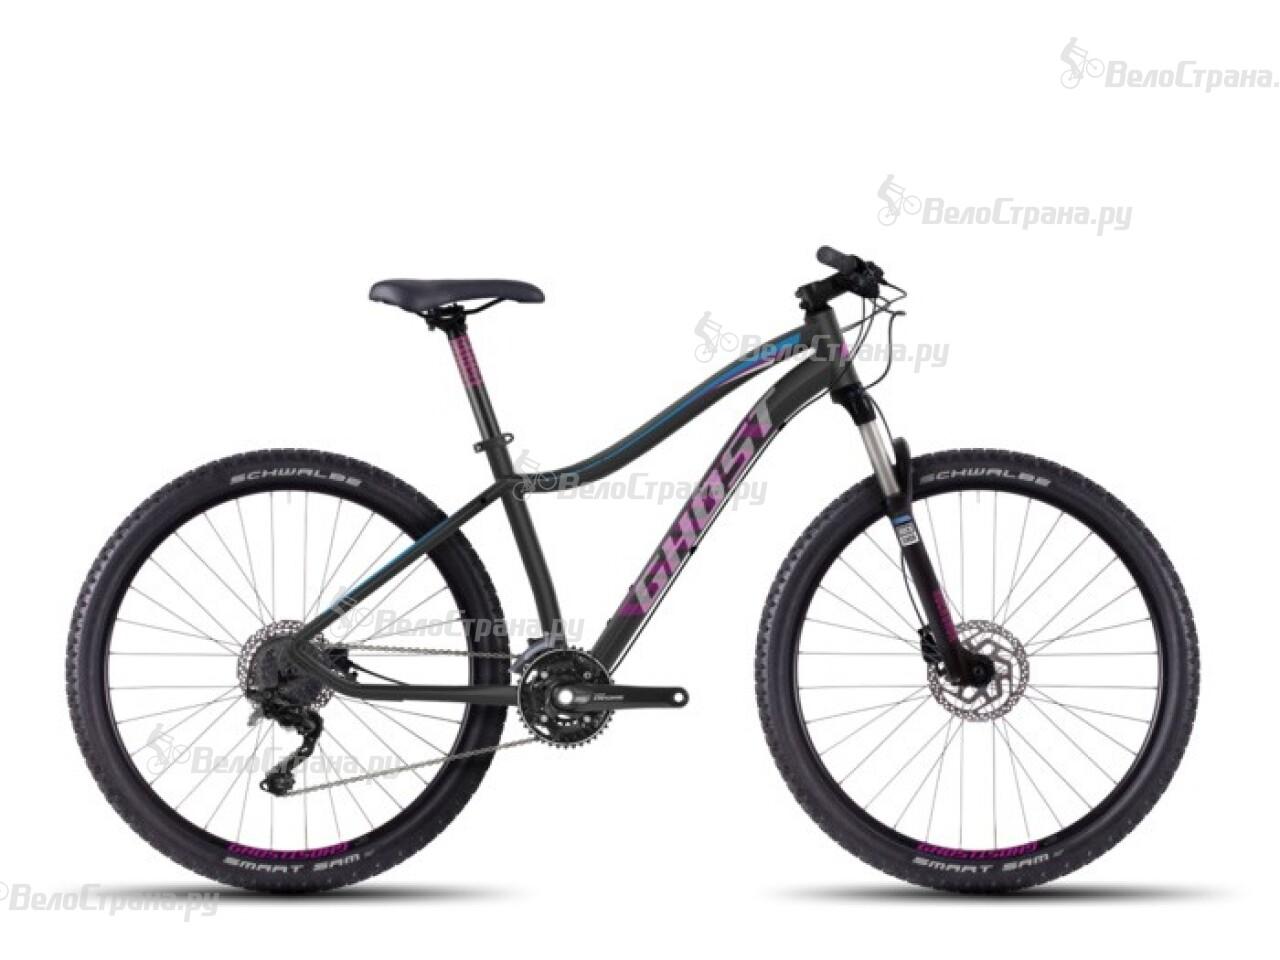 Велосипед Ghost Lanao 7 (2016) велосипед ghost lanao 3 2015